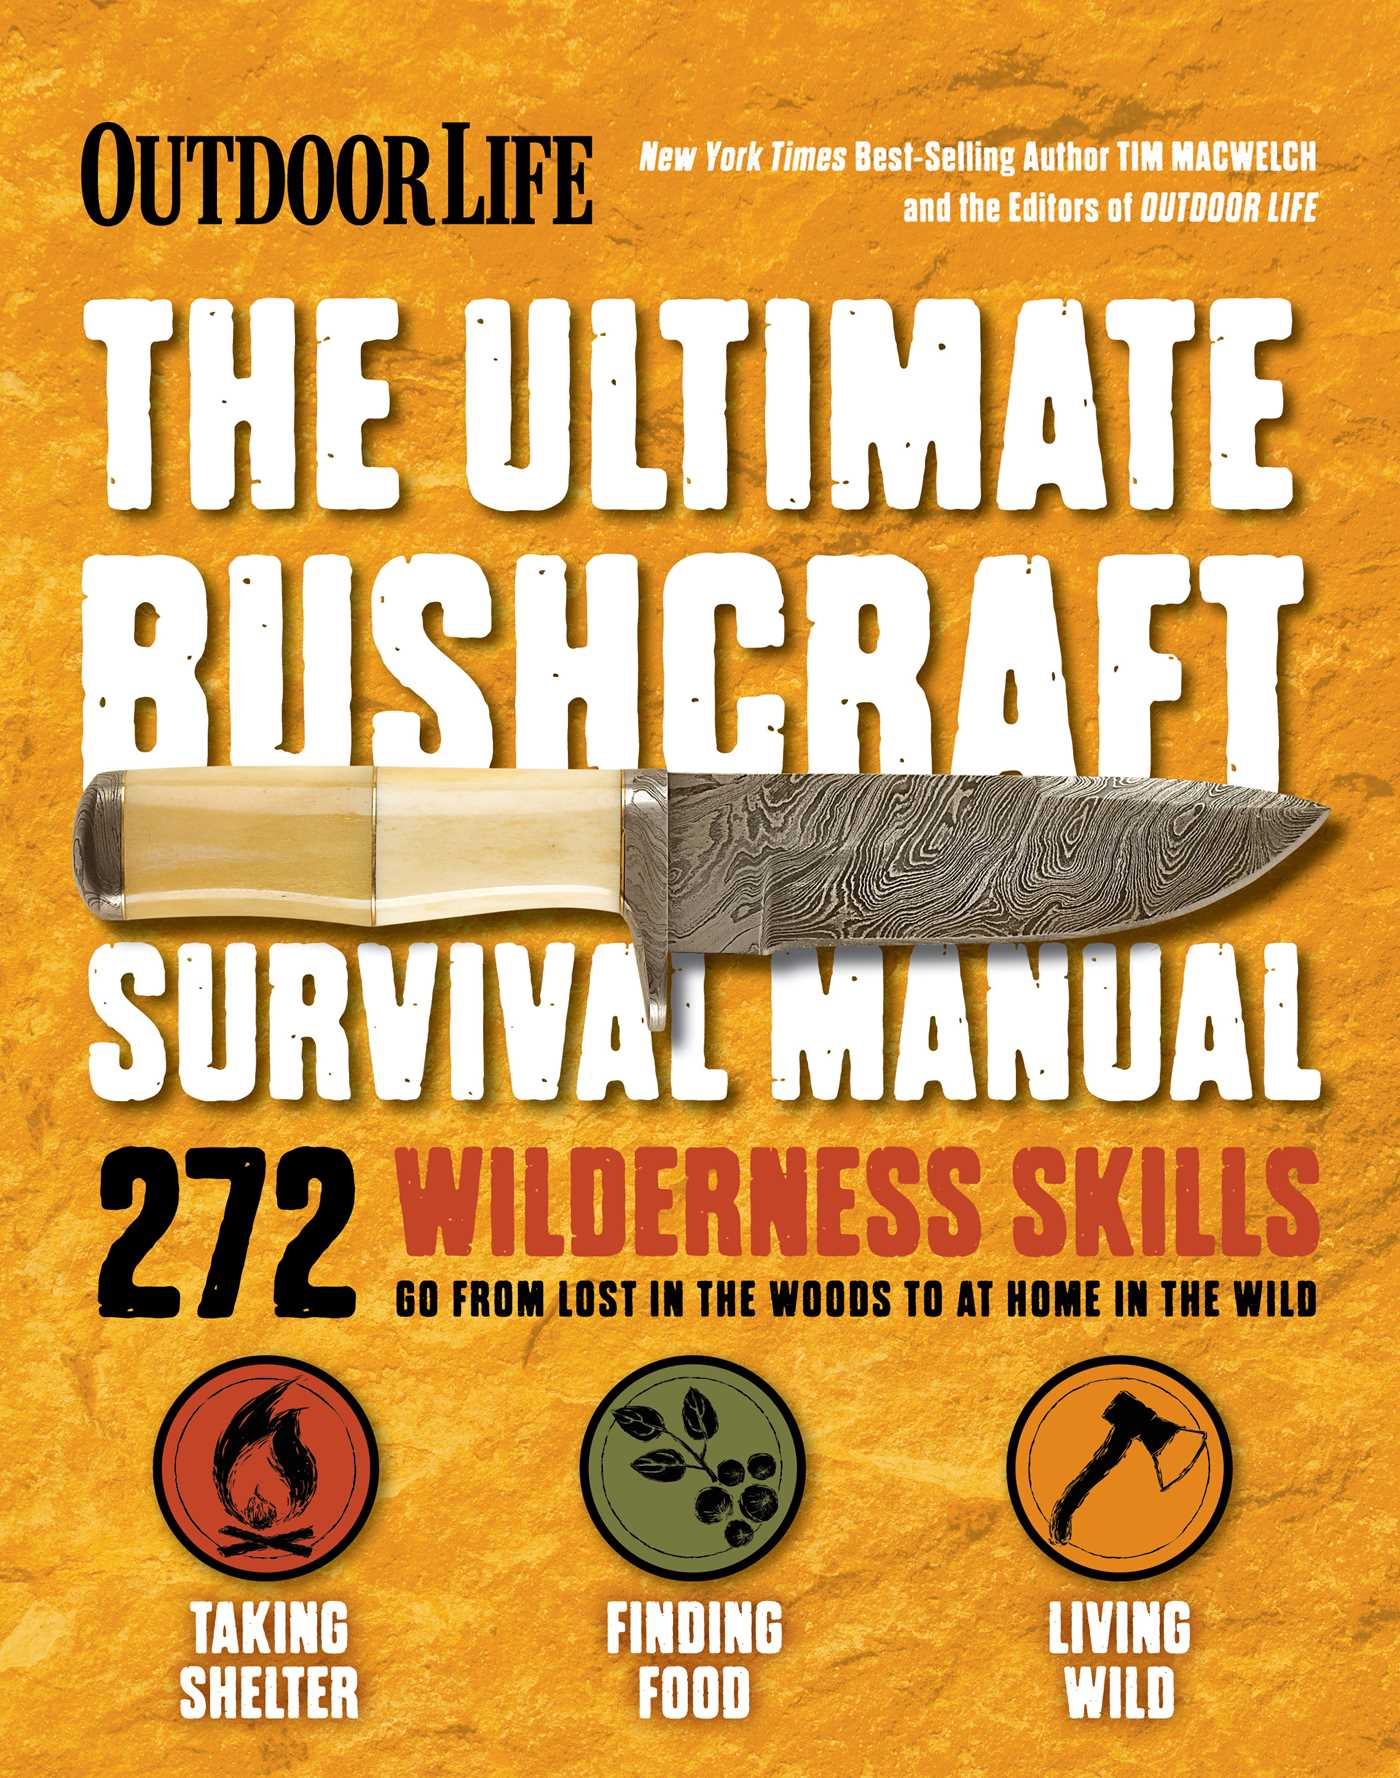 The ultimate bushcraft survival manual 9781681882383 hr